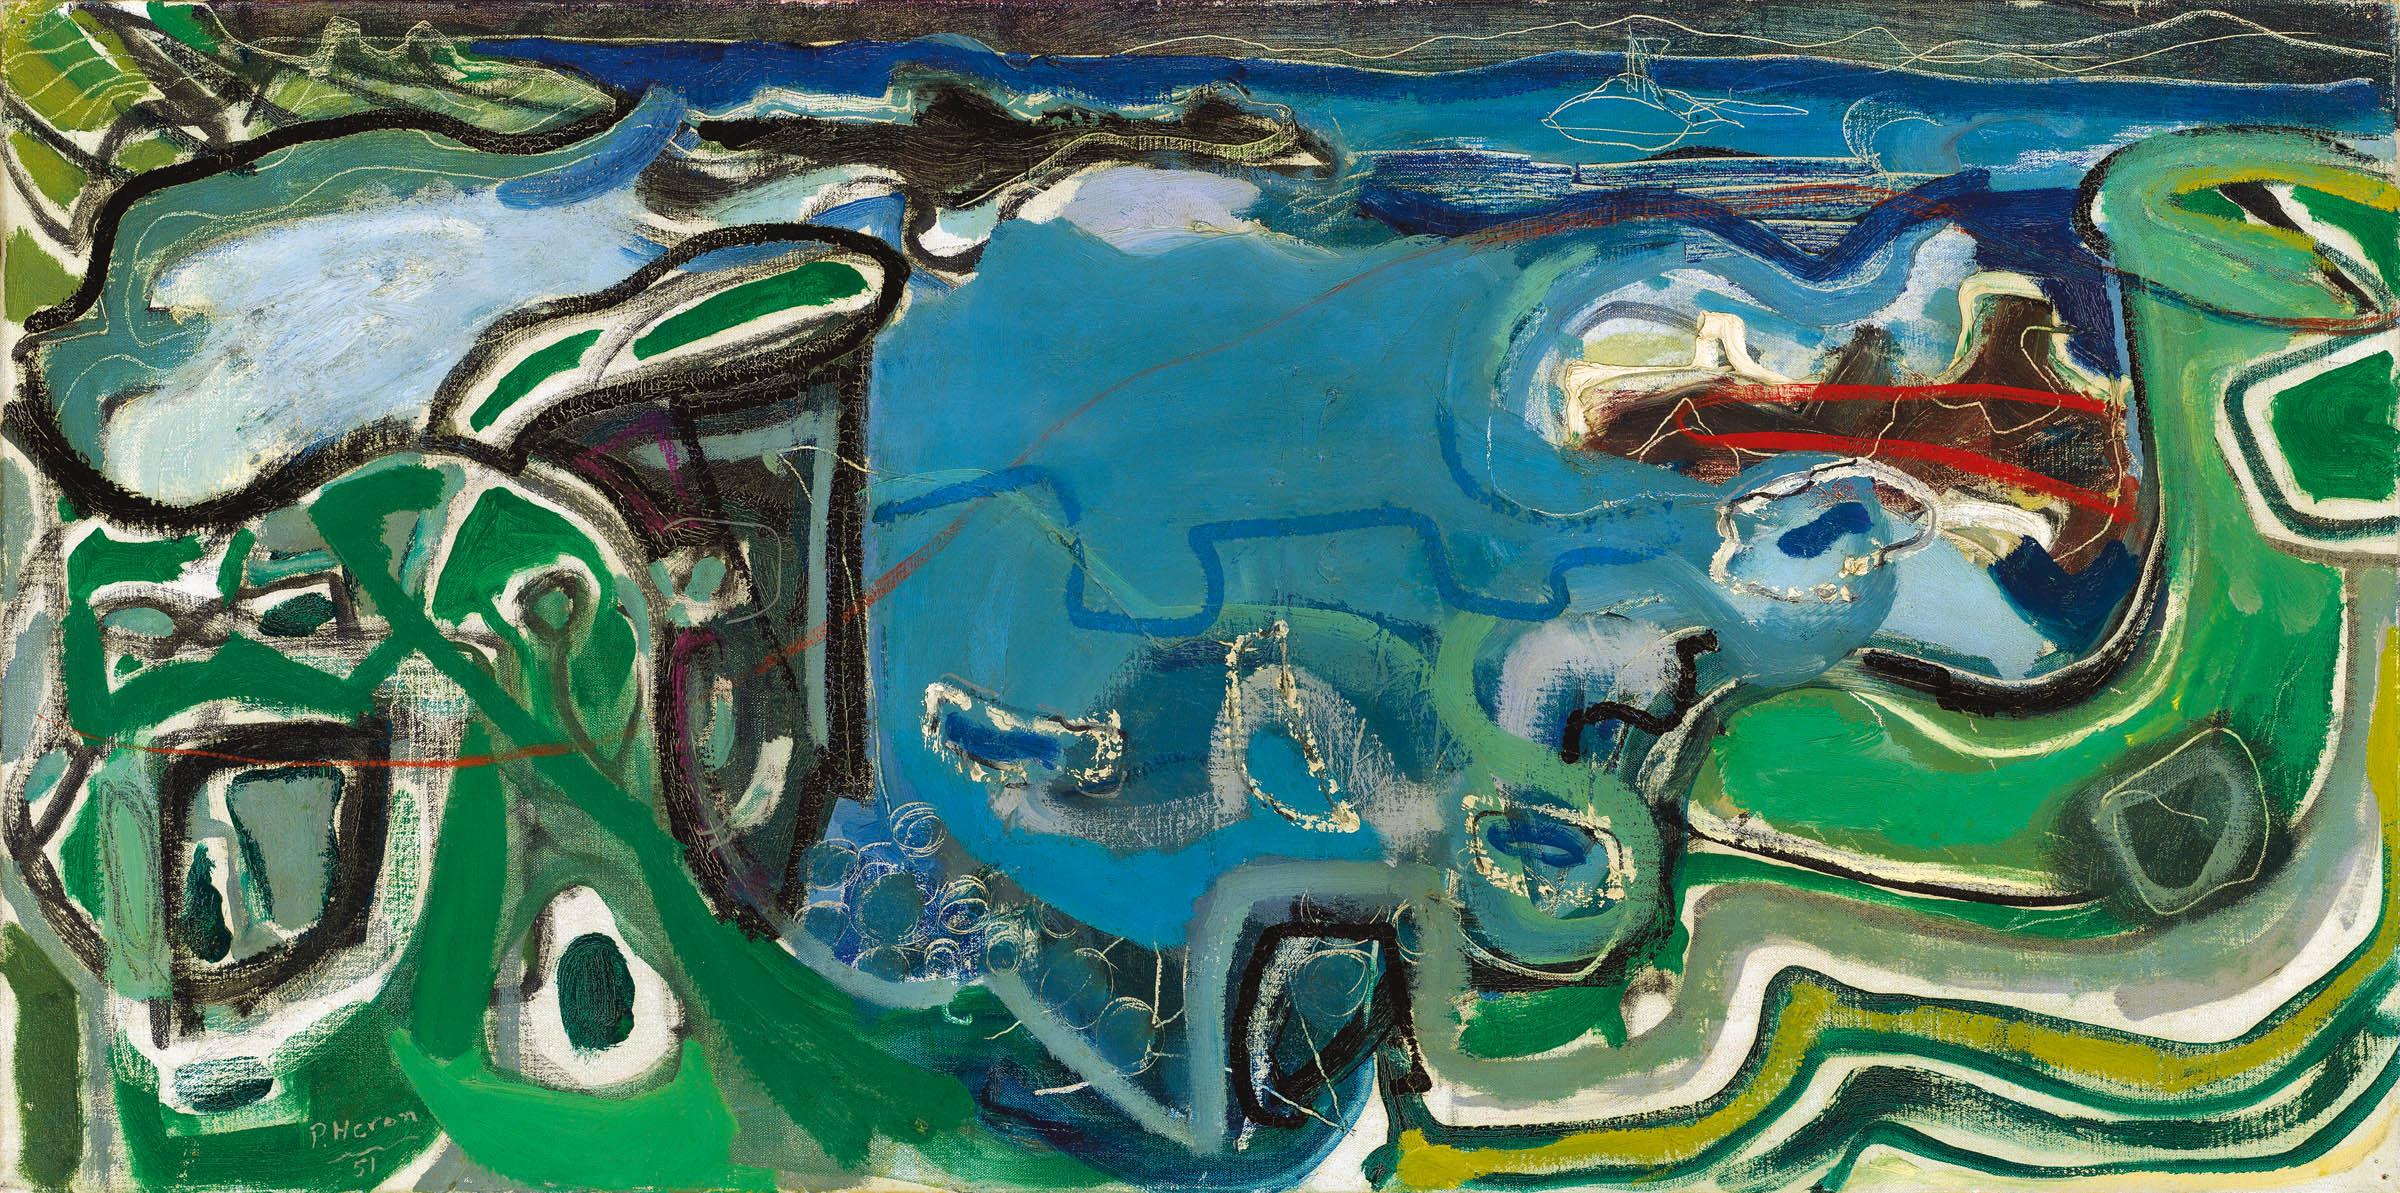 Patrick Heron (1920-1999)